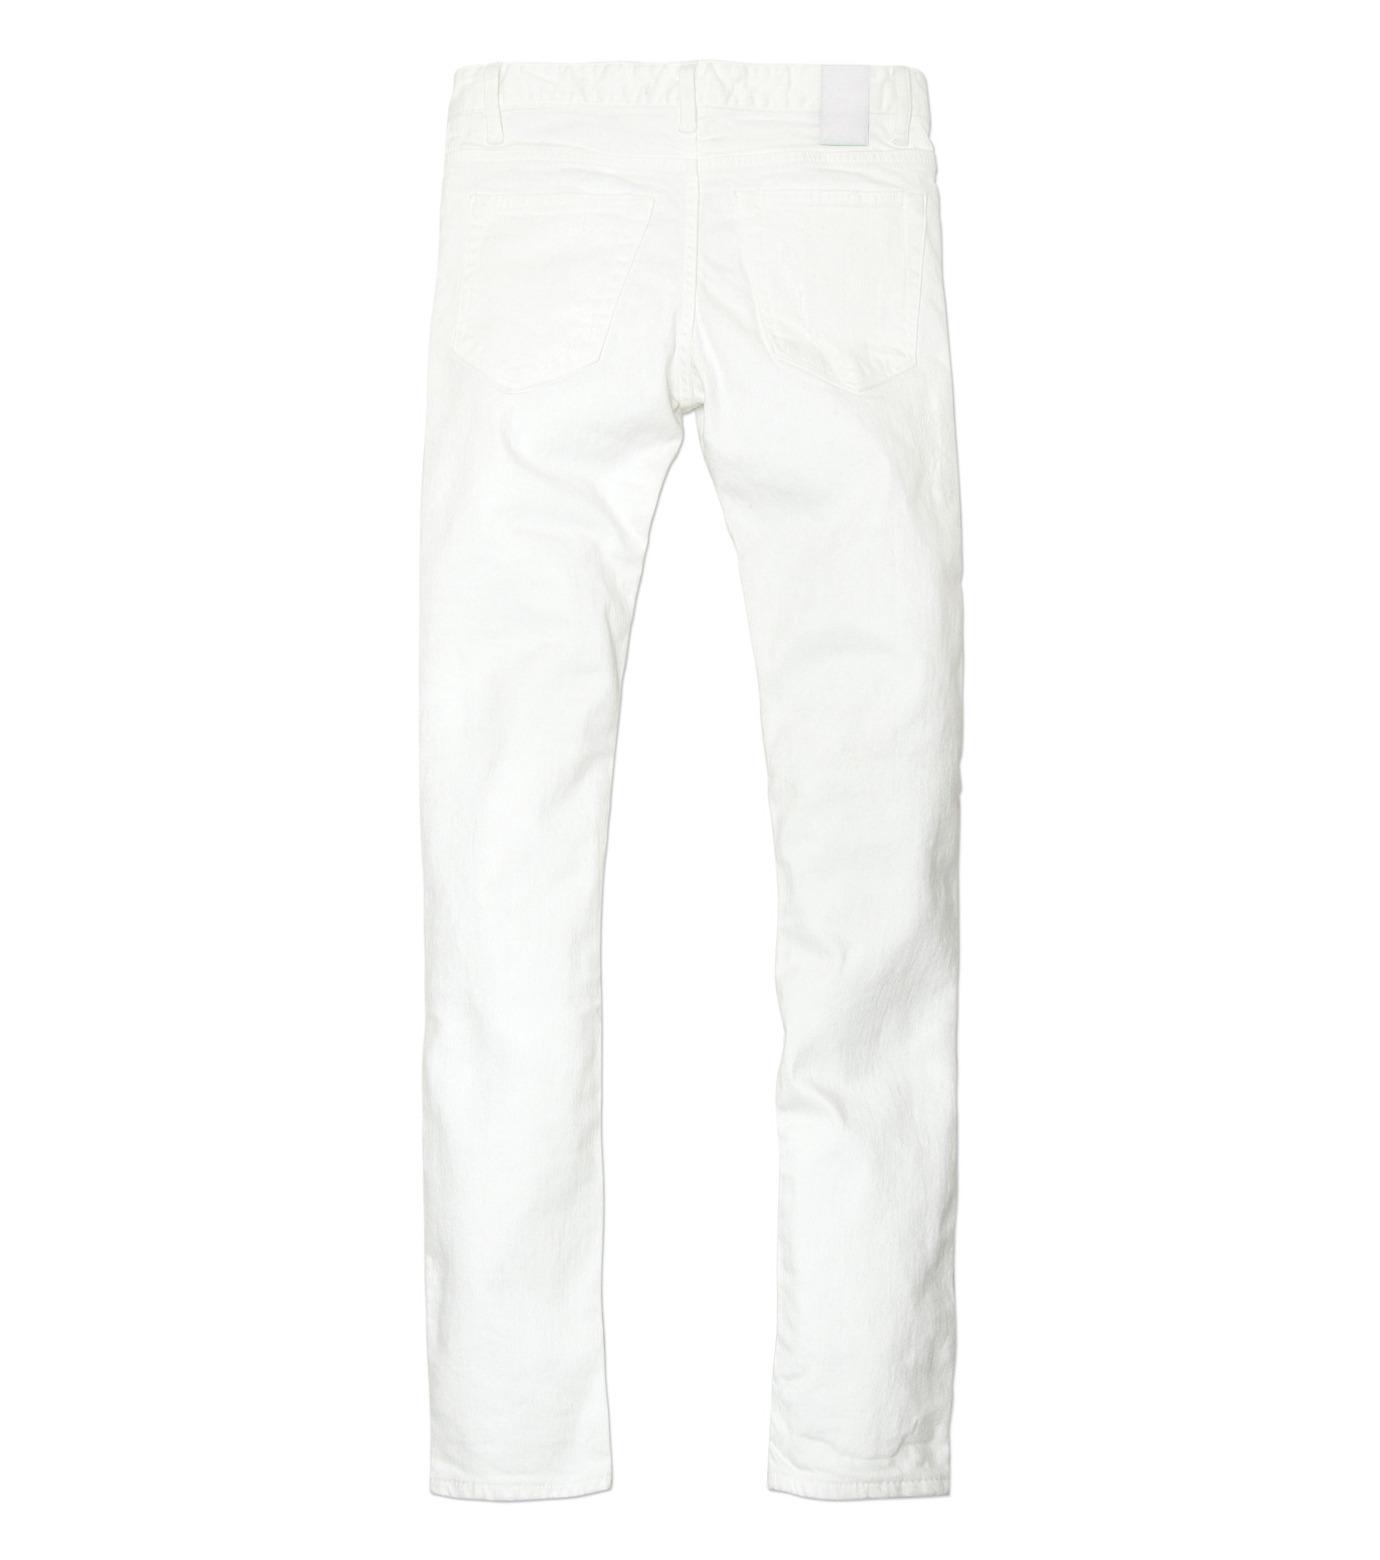 HL HEDDIE LOVU(エイチエル・エディールーヴ)のWhite Damage Denim-WHITE(パンツ/pants)-17S98002-4 拡大詳細画像6